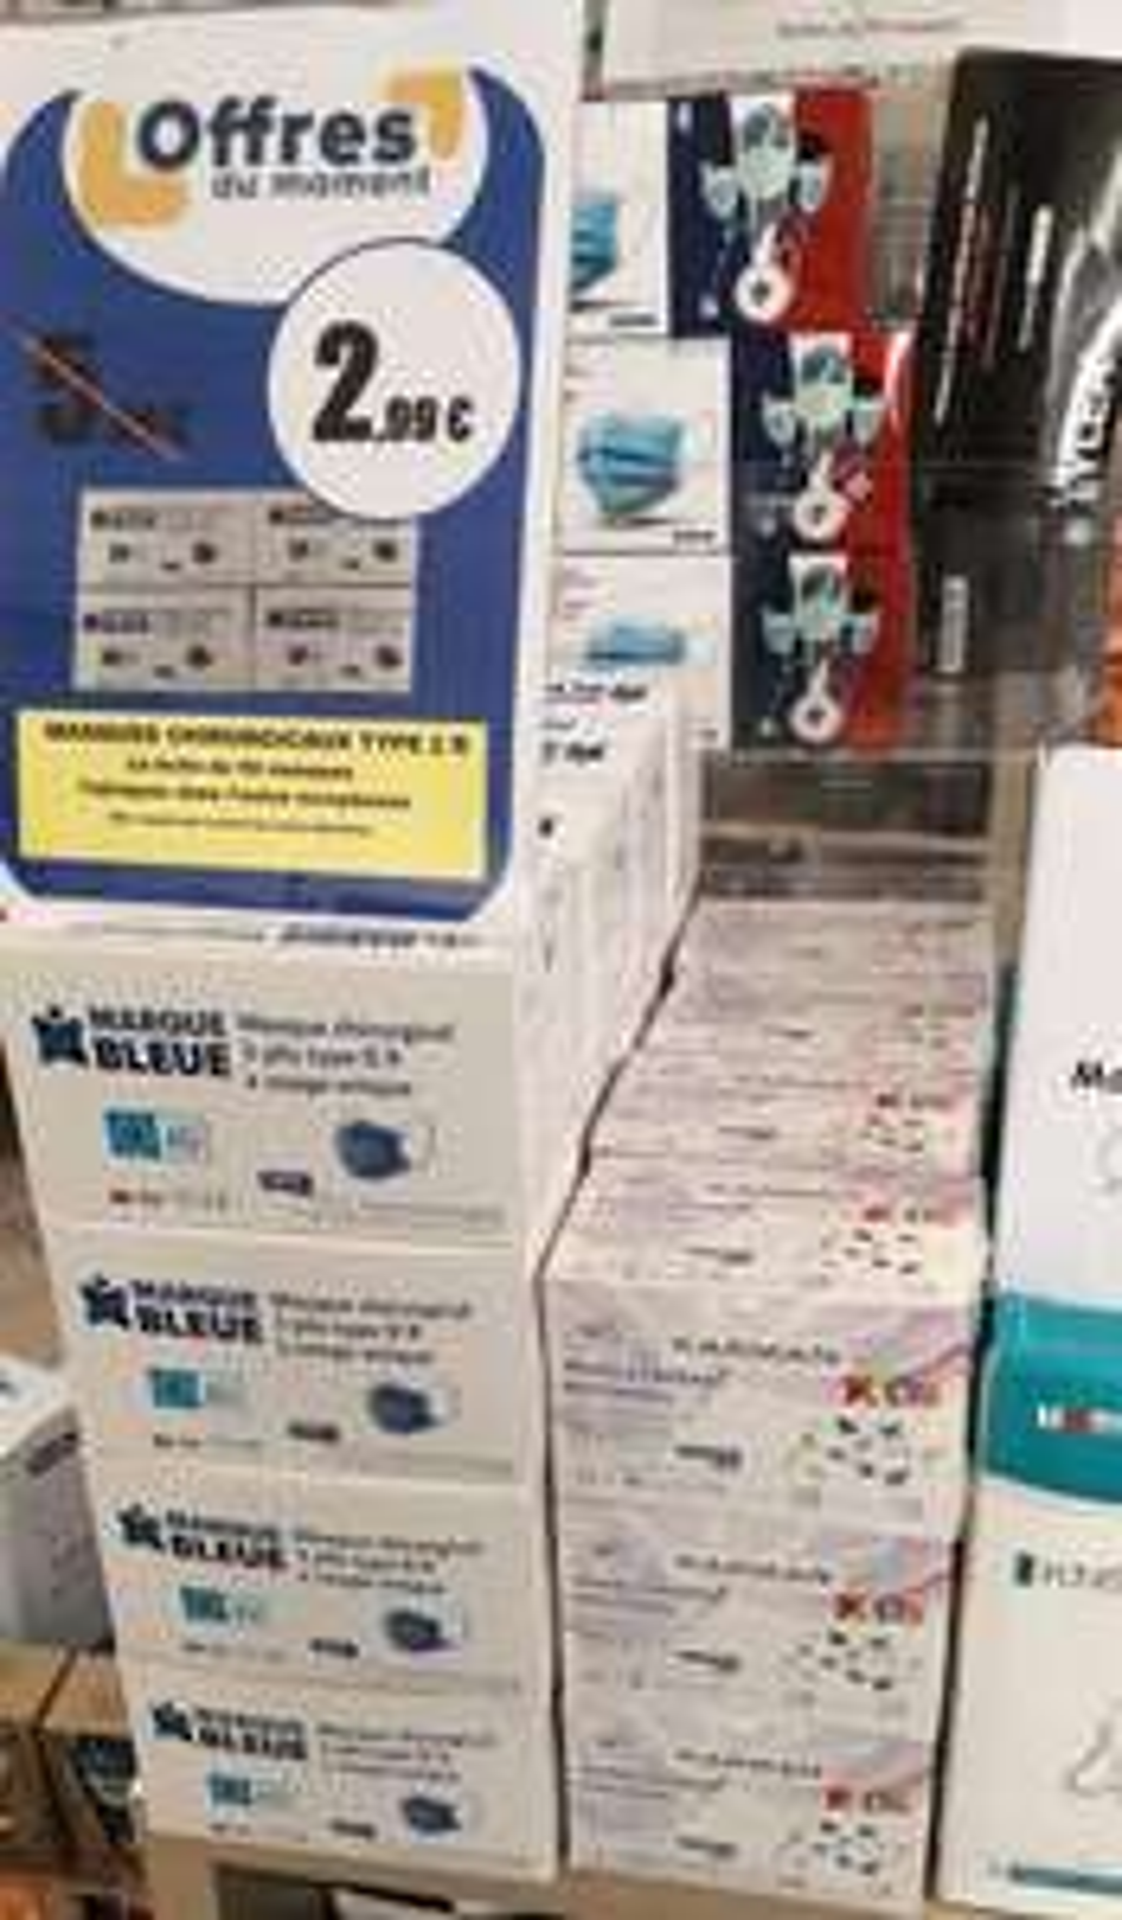 Boîte de 50 masques chirurgicaux type 2R normes EN14683 - Pharmacie About Servance-Miellin (70)